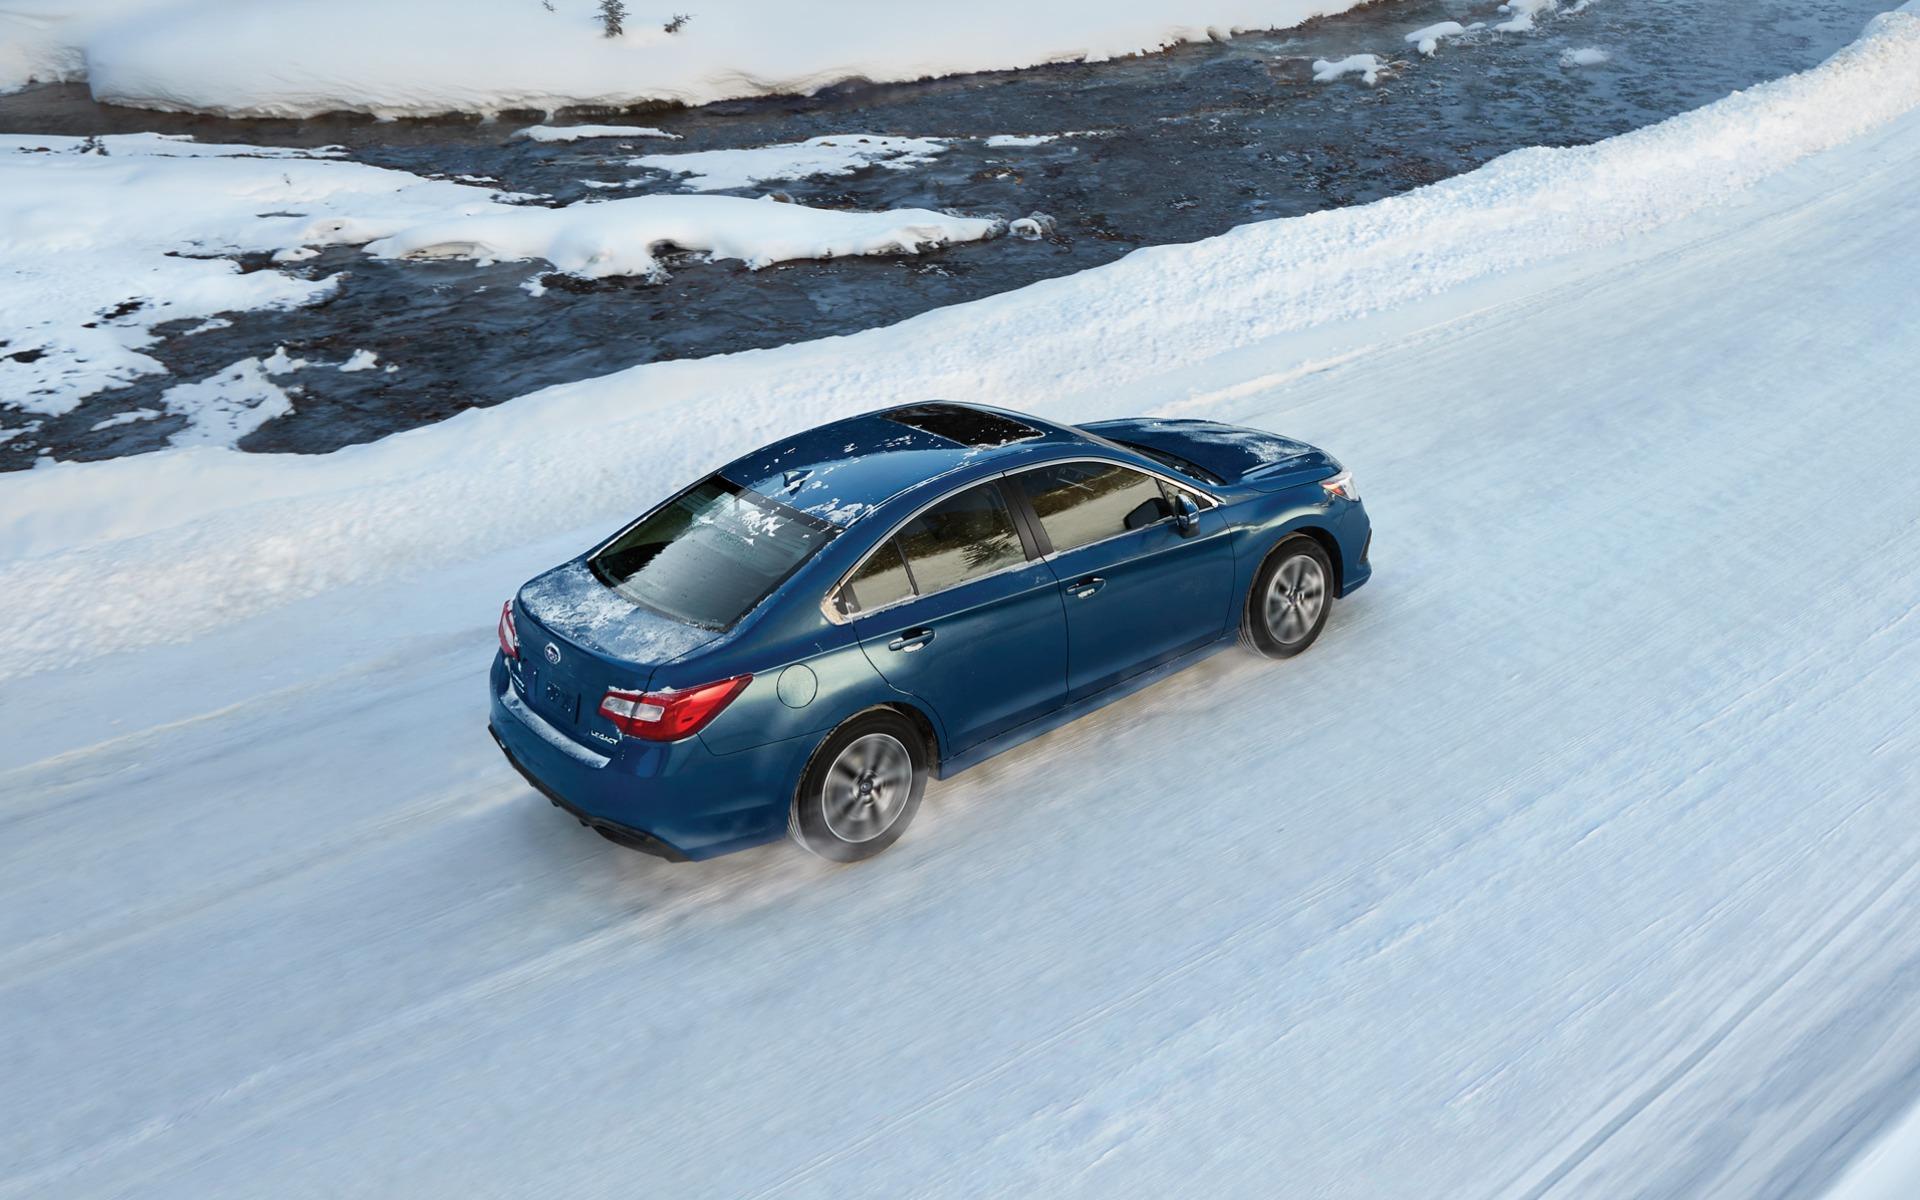 Subaru Legacy 2019 : cinq choses à savoir 361700_2019_Subaru_Legacy